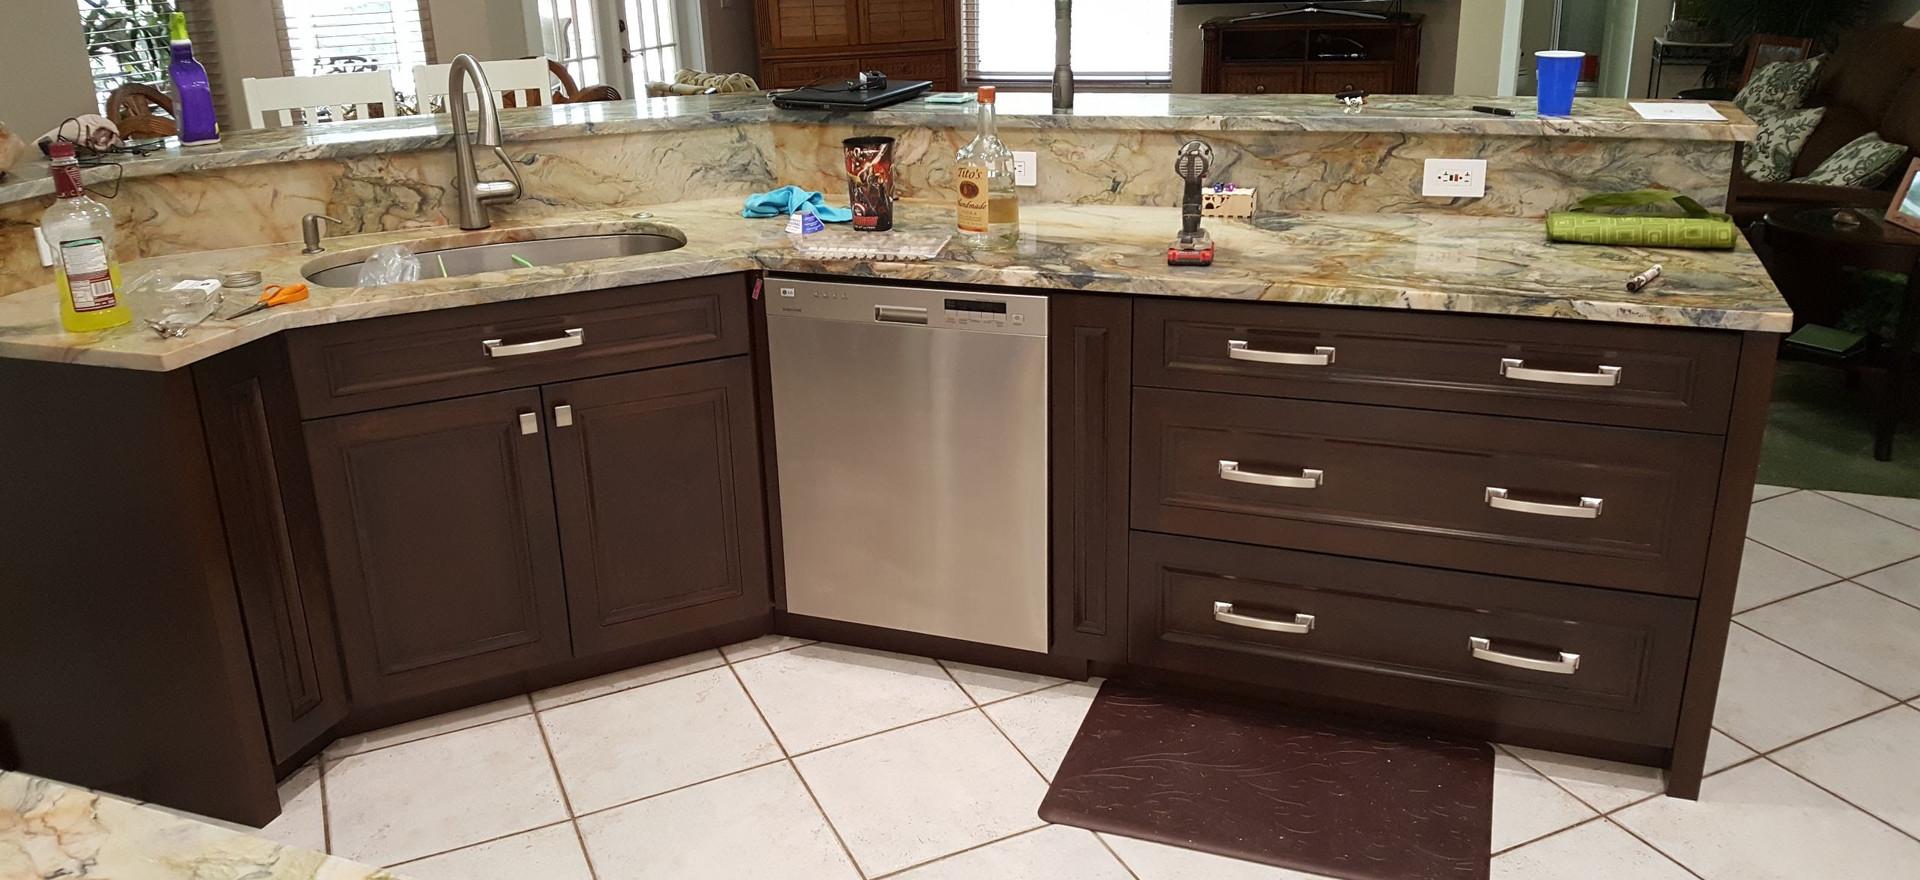 Shaker Styel Cabinets